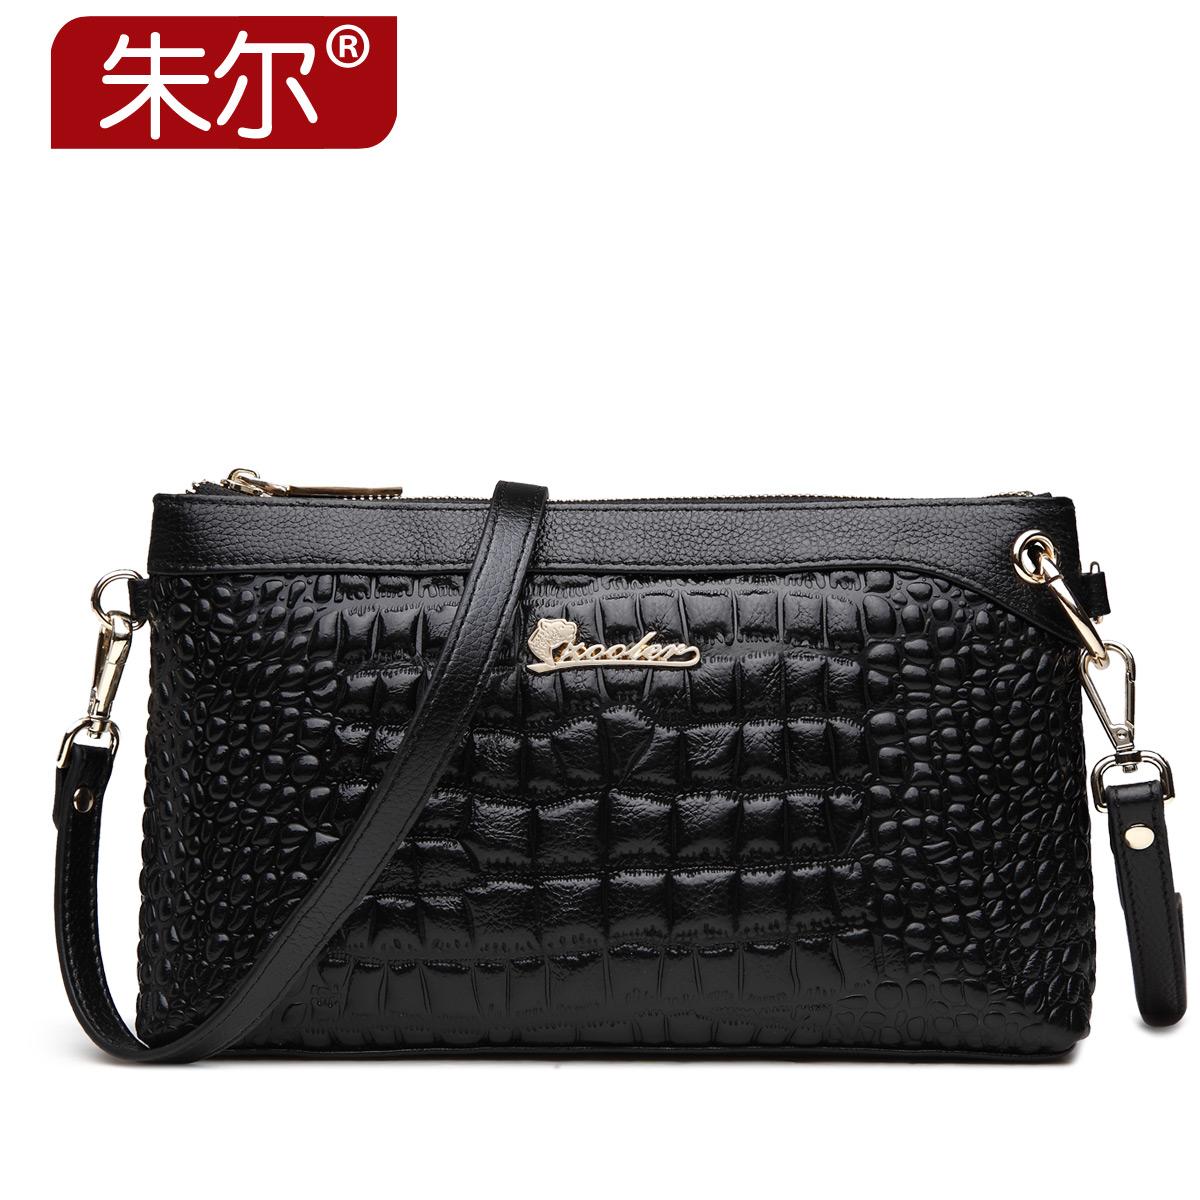 Genuine cowhide leather day clutch fashion clutch bag 2015 women's handbag small bag women's bags